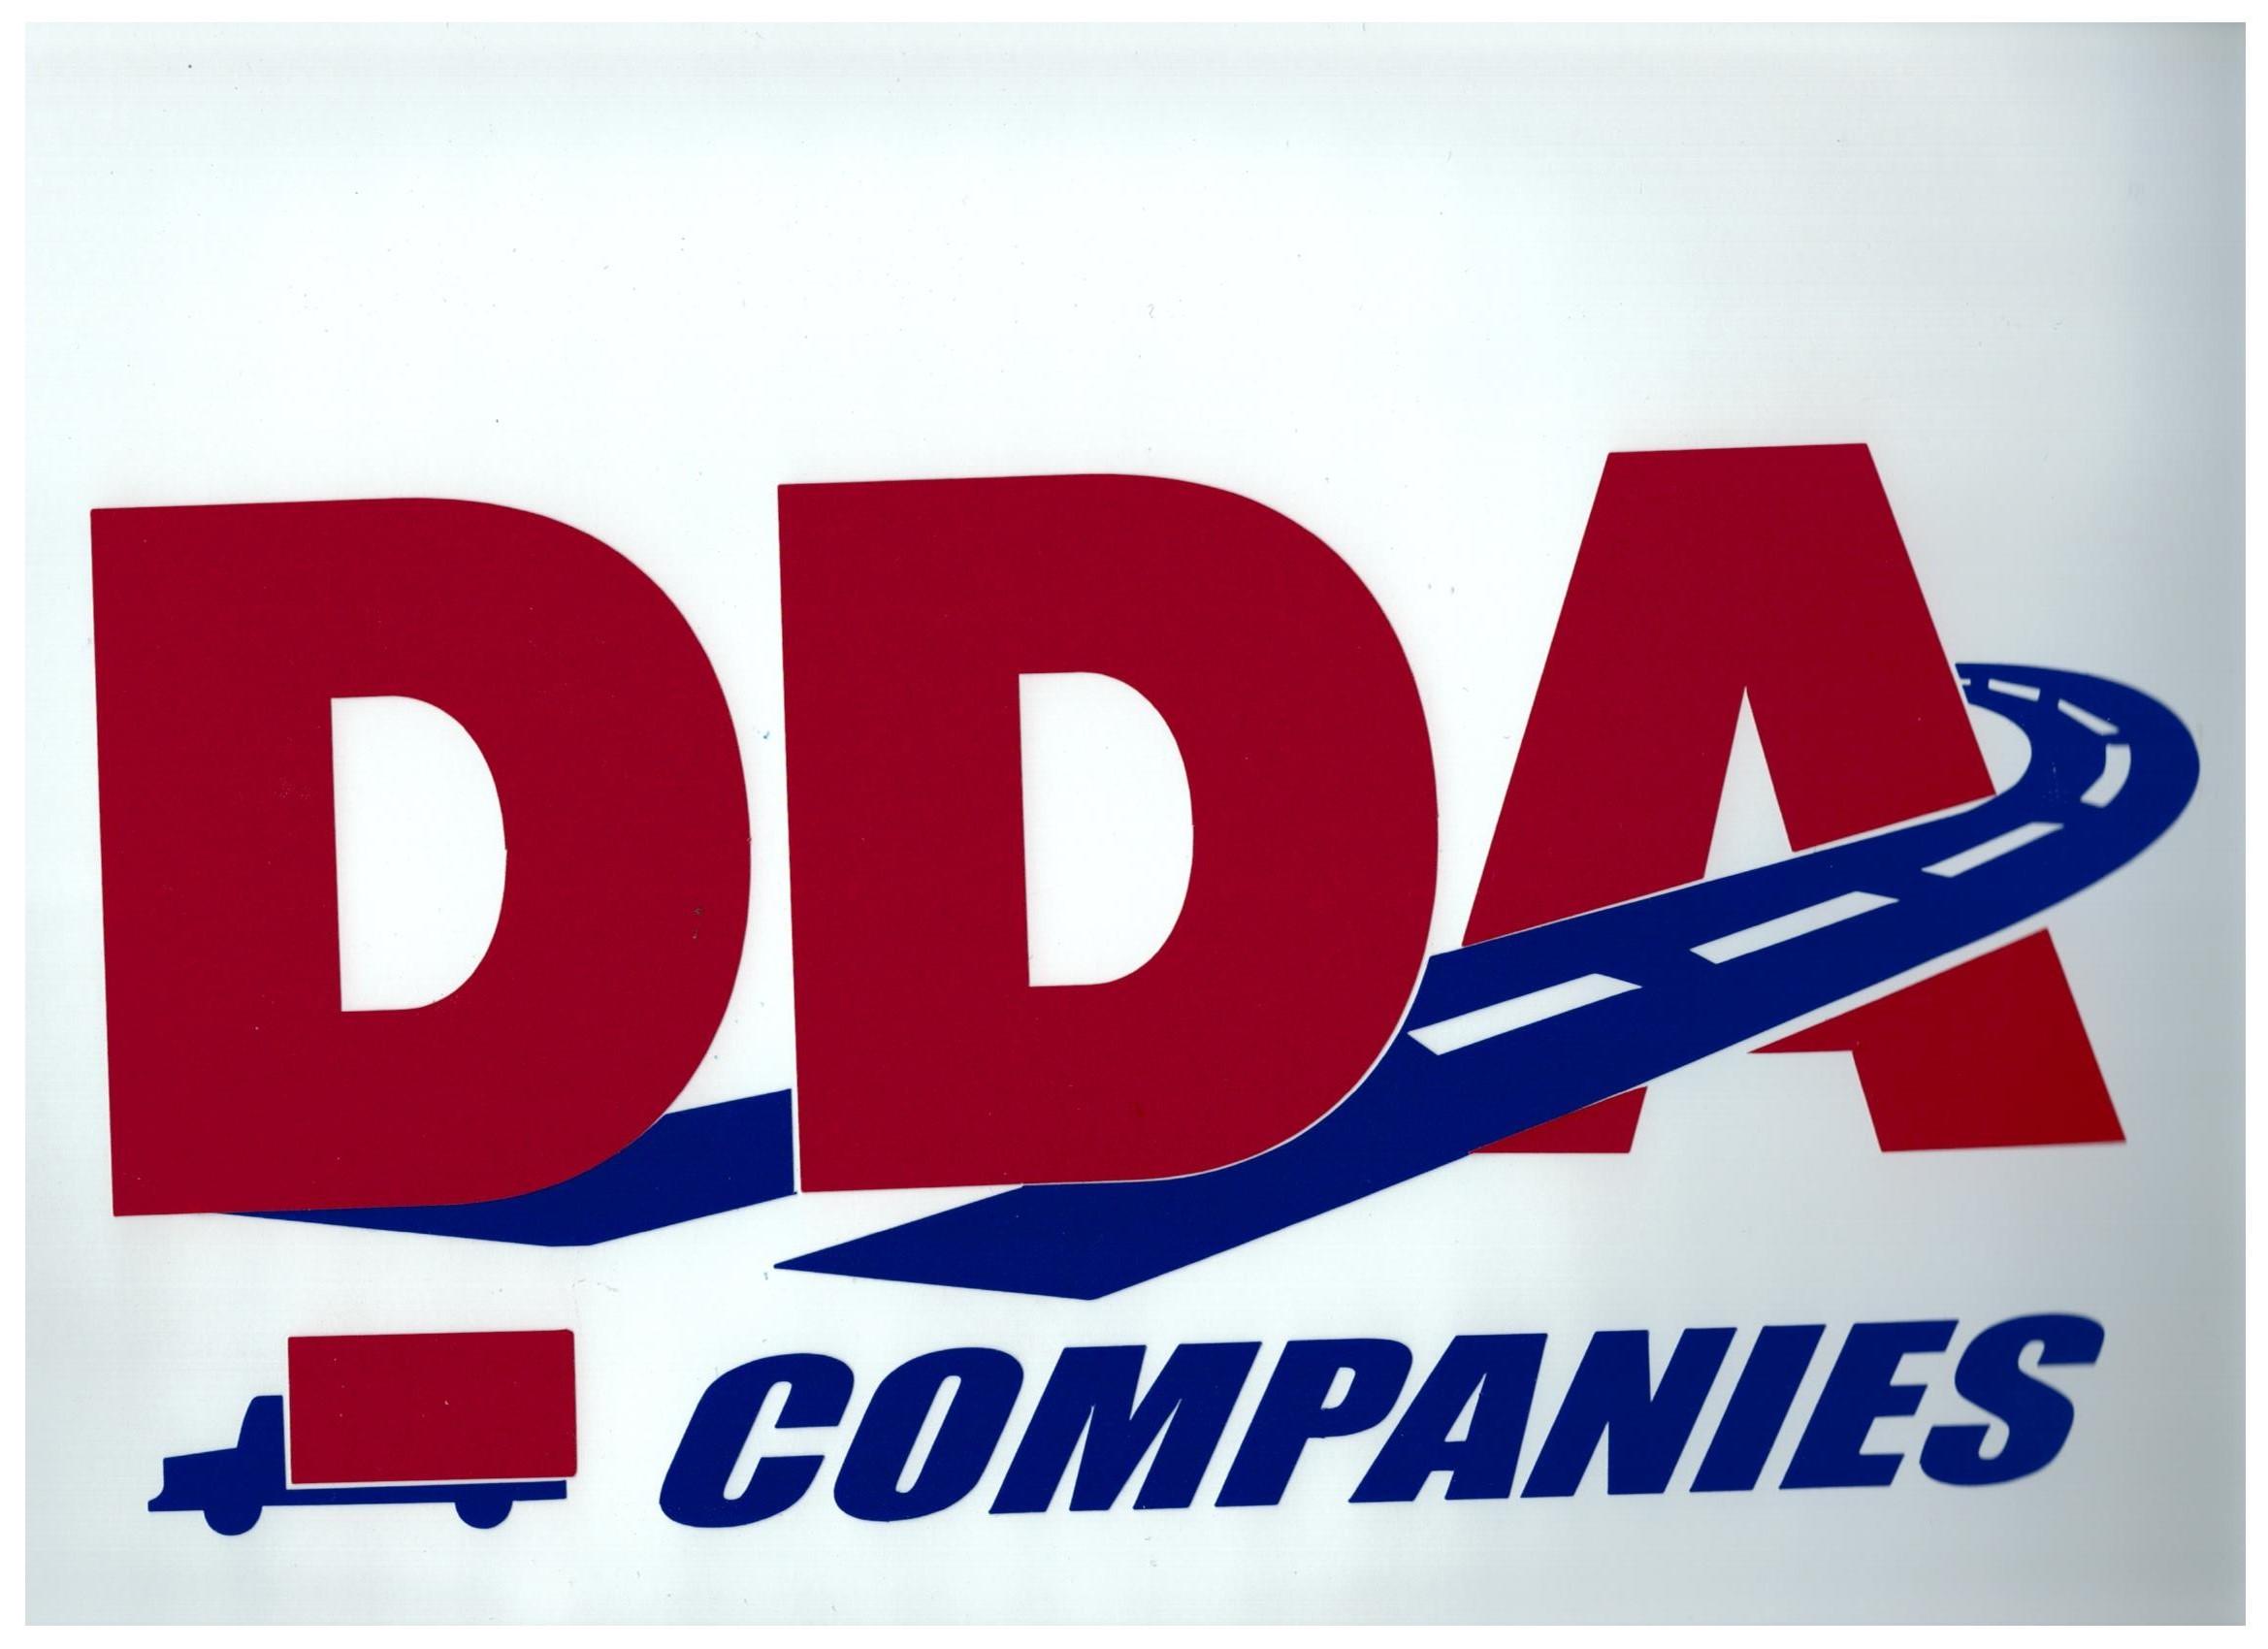 image of DDA logo